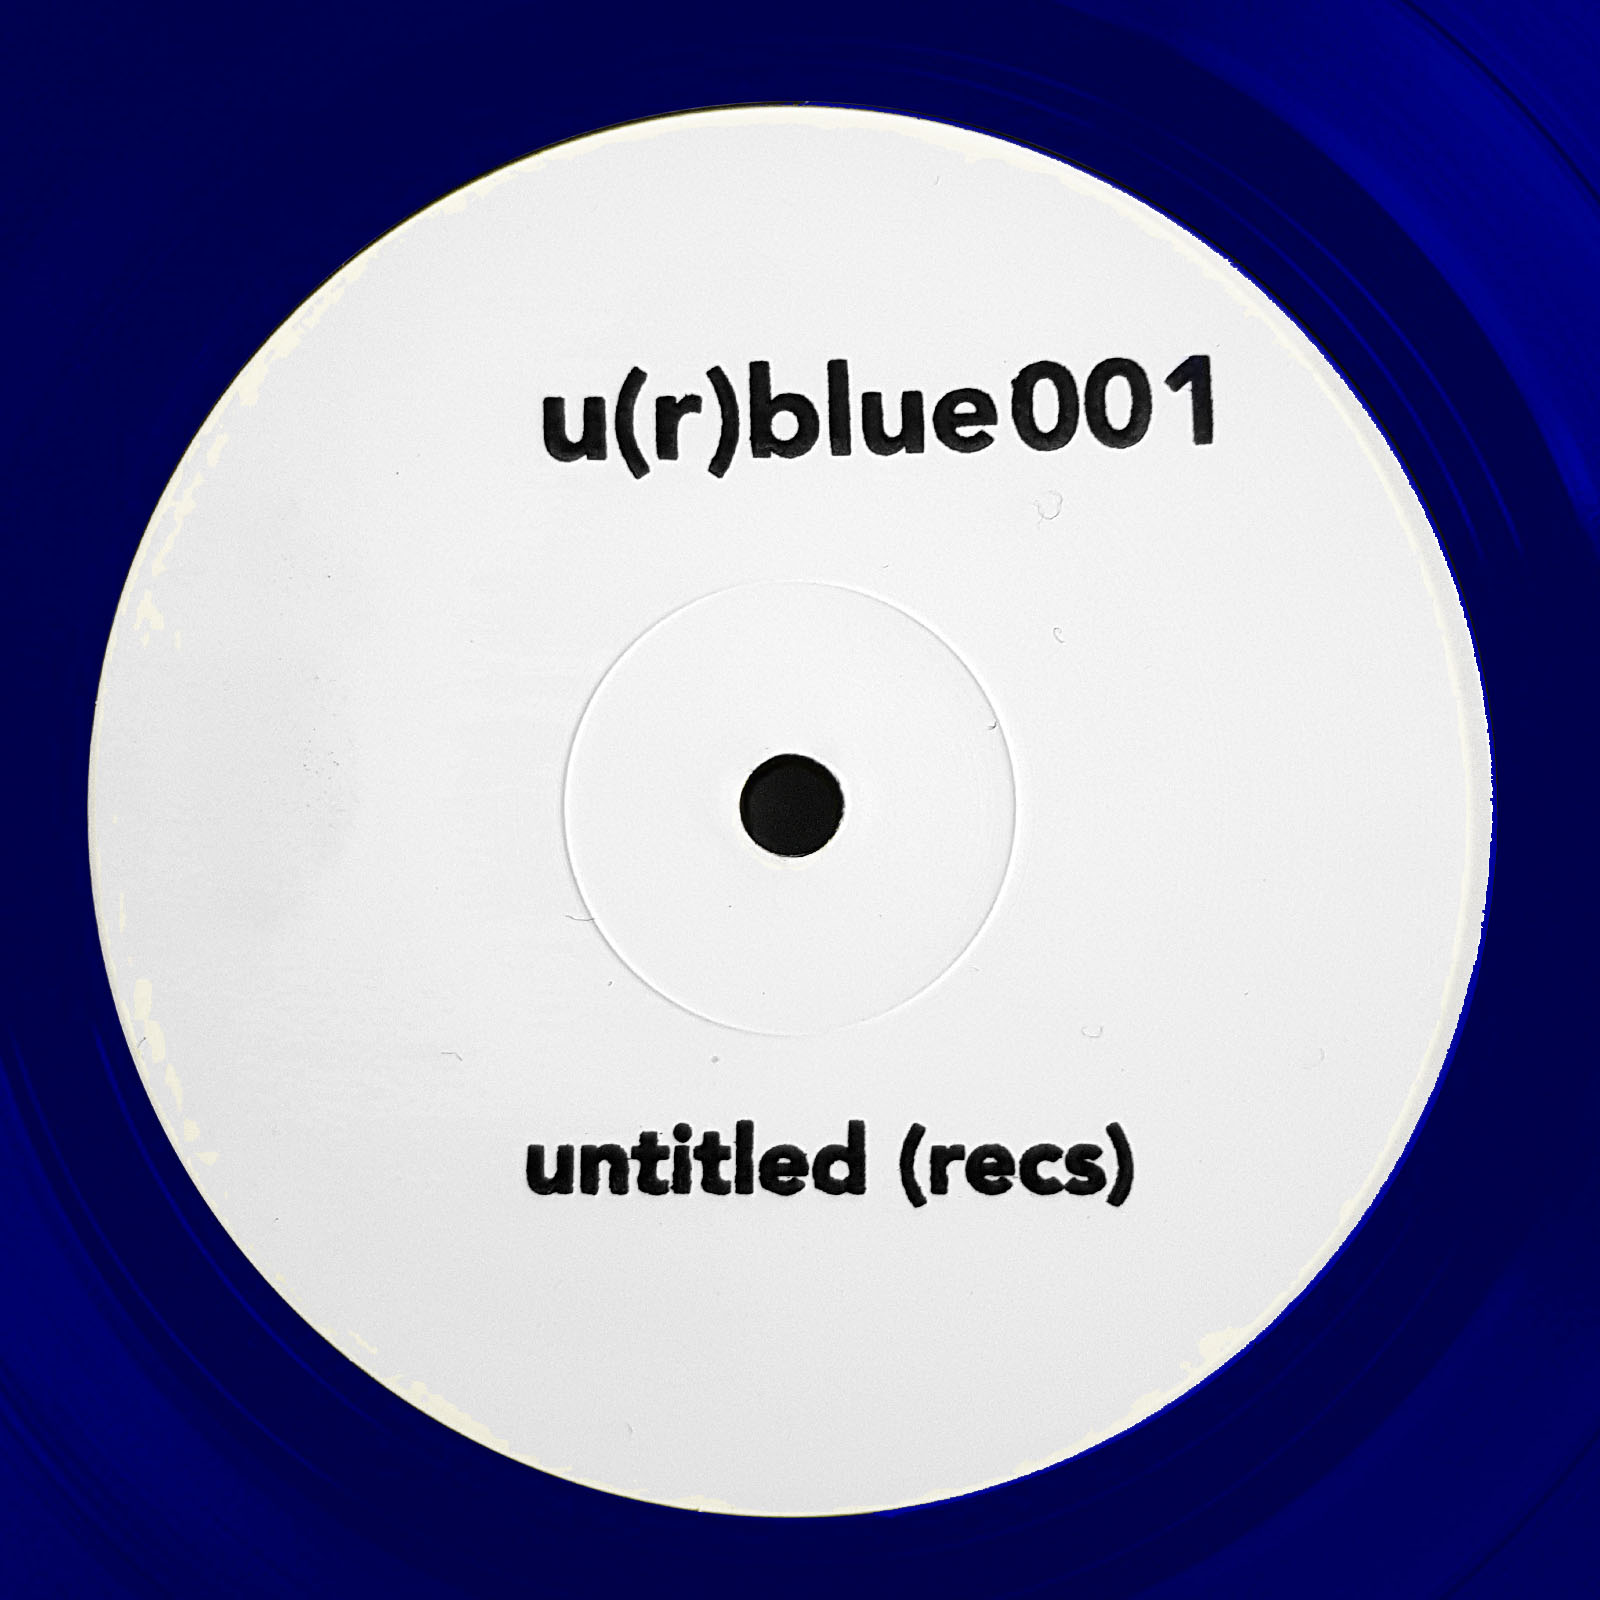 U(r)blue001_Spotify.jpg